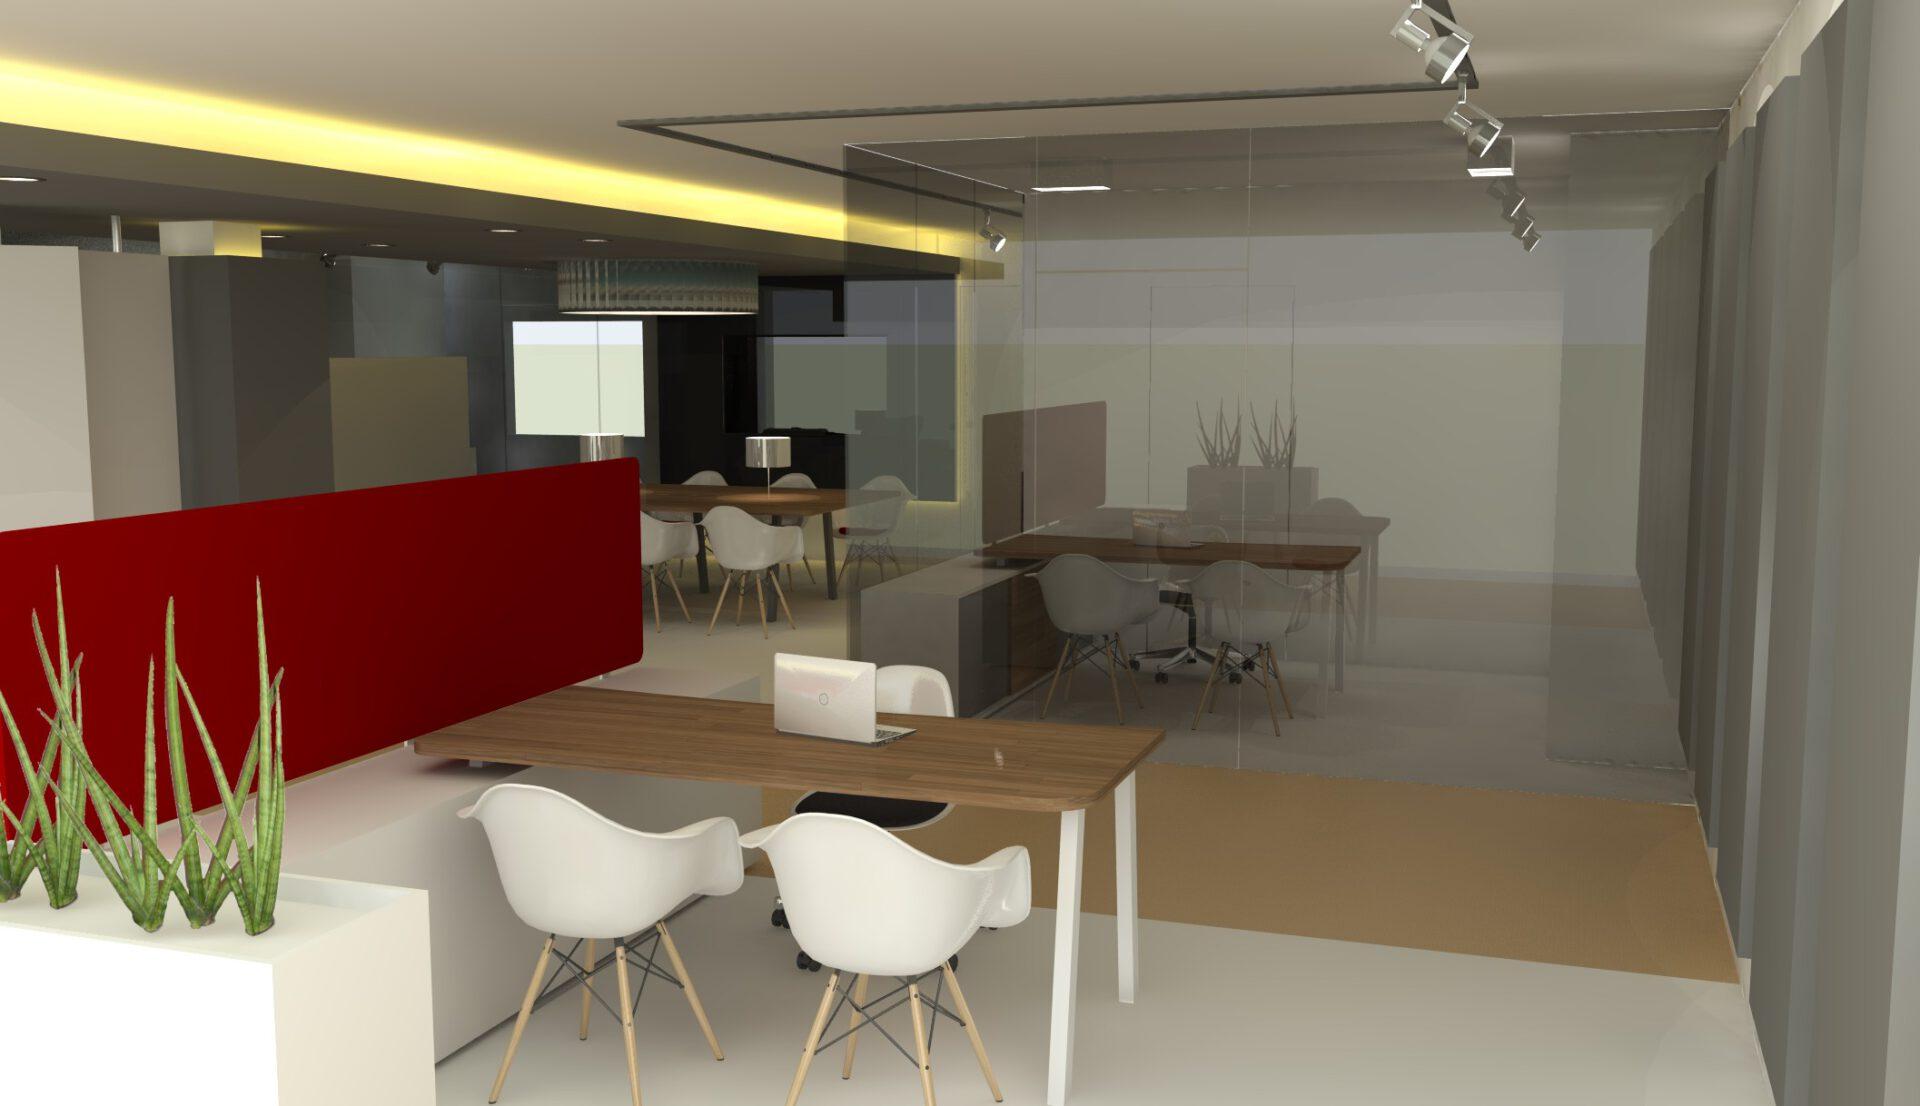 interieur ontwerp kantoor